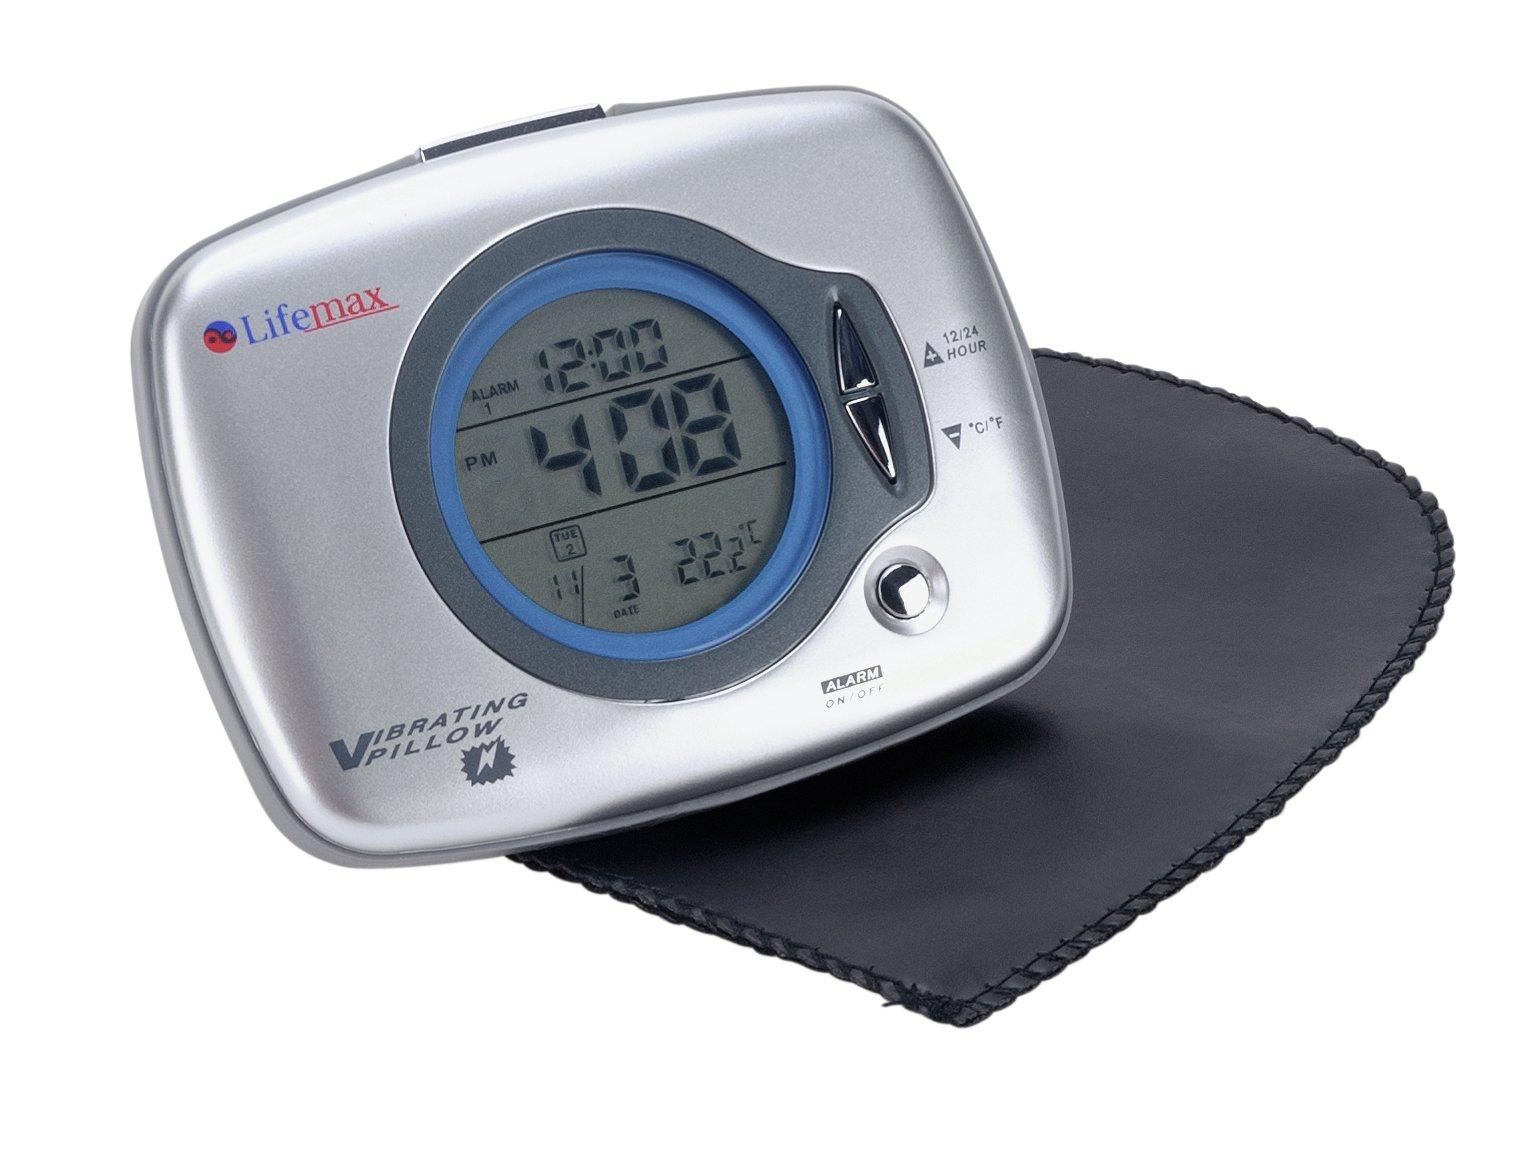 Buy Lifemax Under Pillow Vibration Alarm Clock Clocks Argos